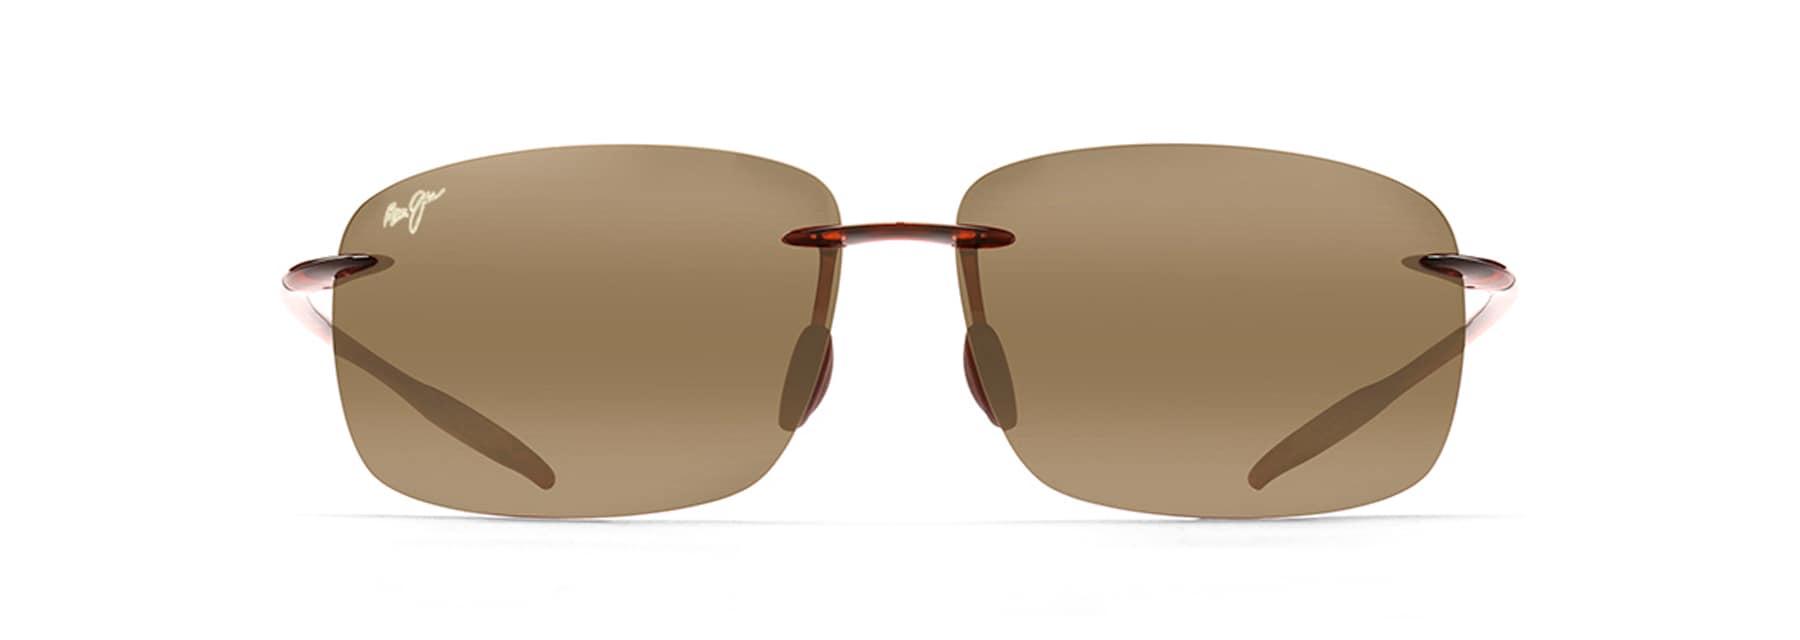 8ab3354e546 Breakwall Polarised Sunglasses